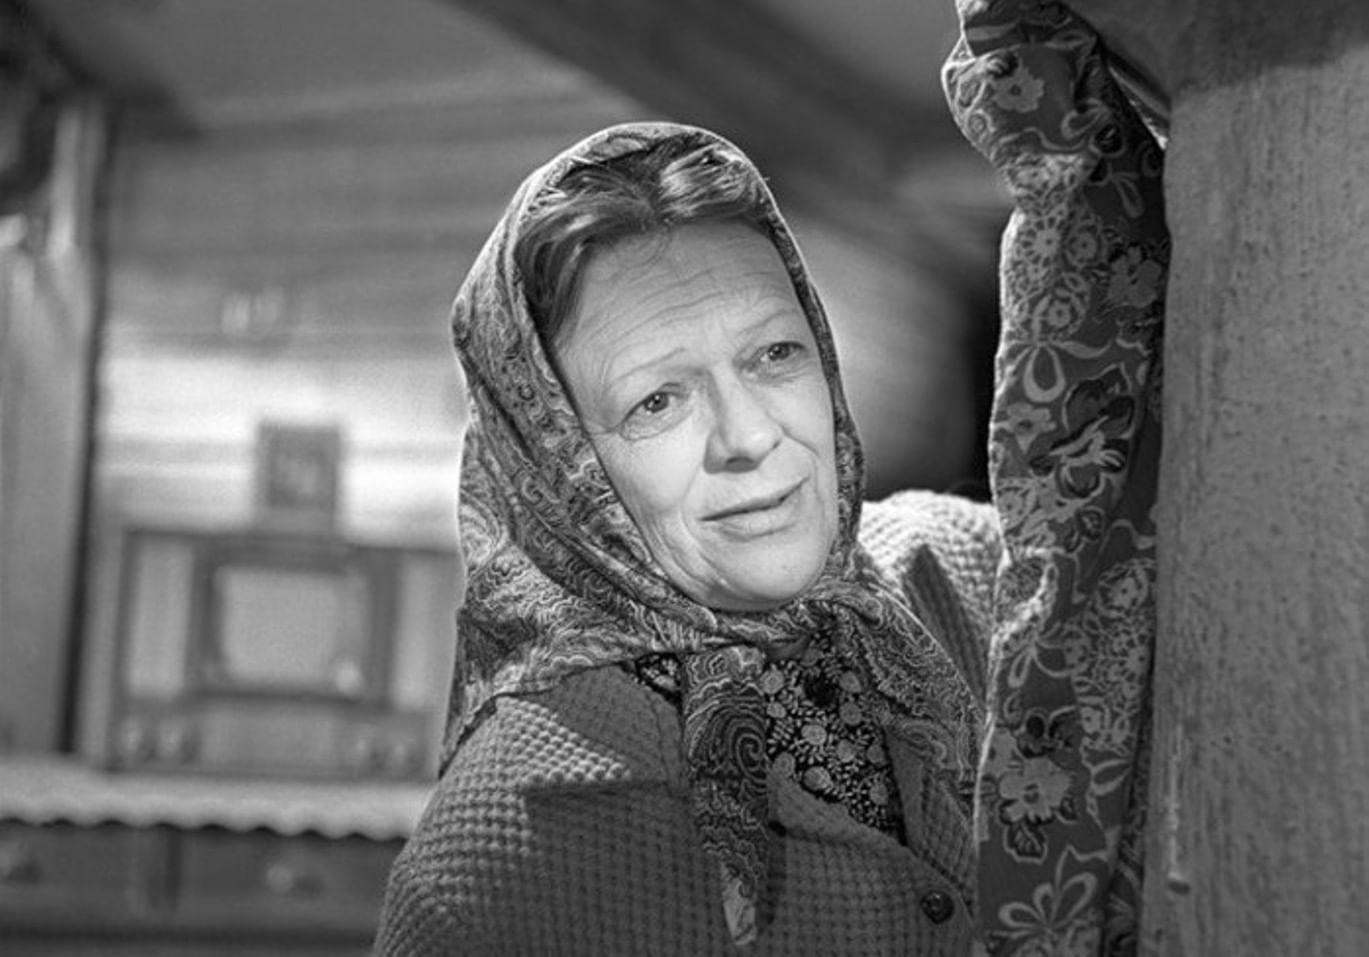 Любимая бабушка Татьяна Пельтцер - галерея